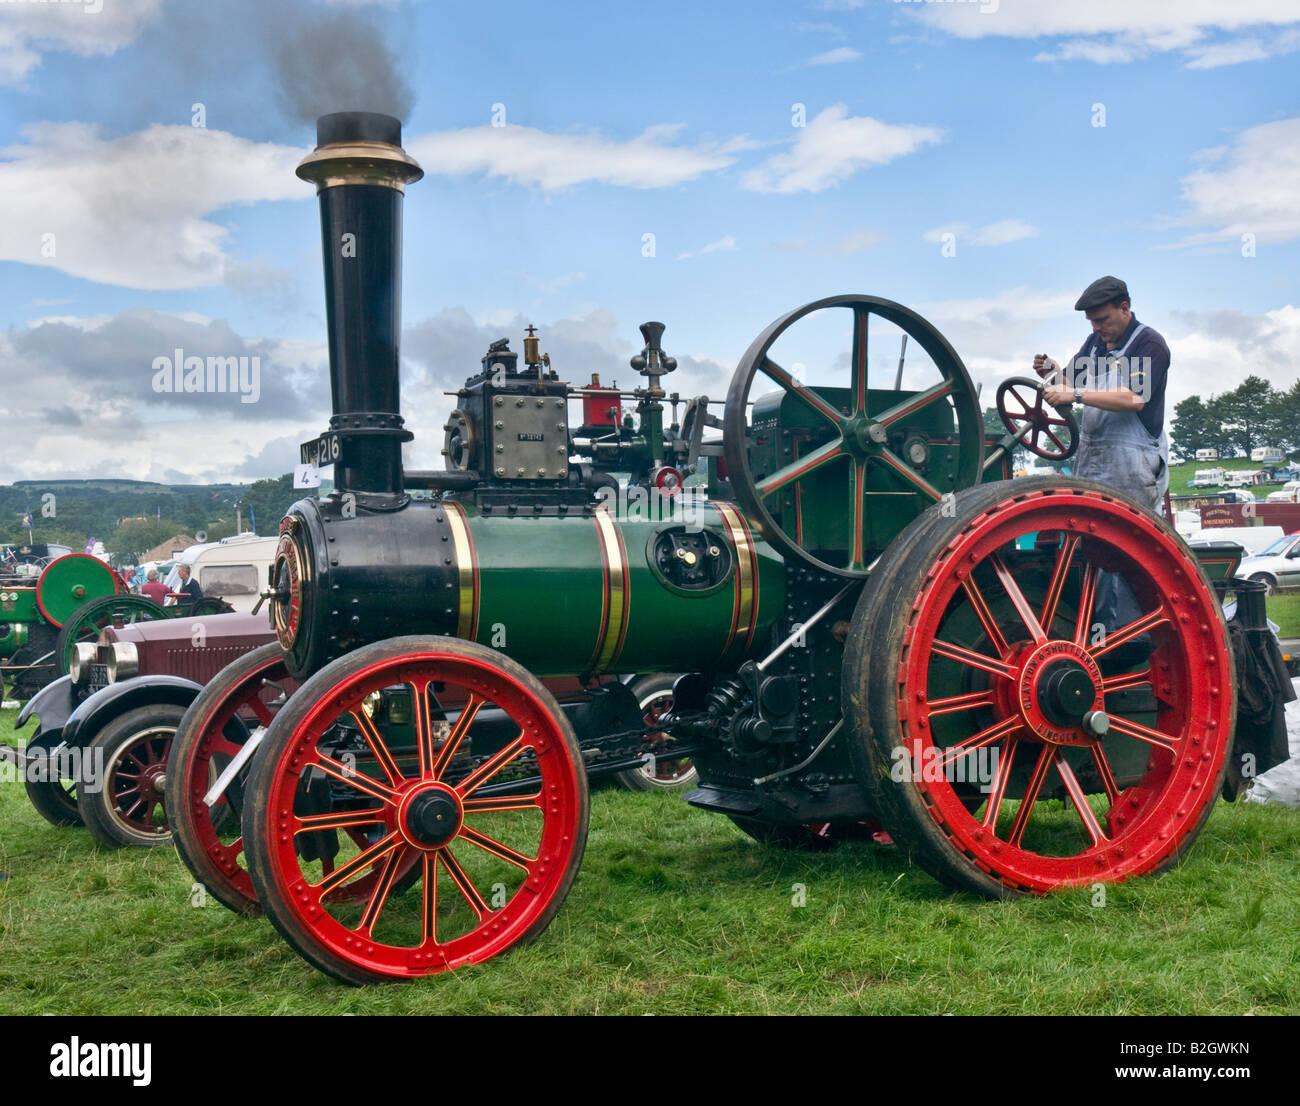 Traction engine at Masham Steam Engine and Fair Organ Rally - Stock Image